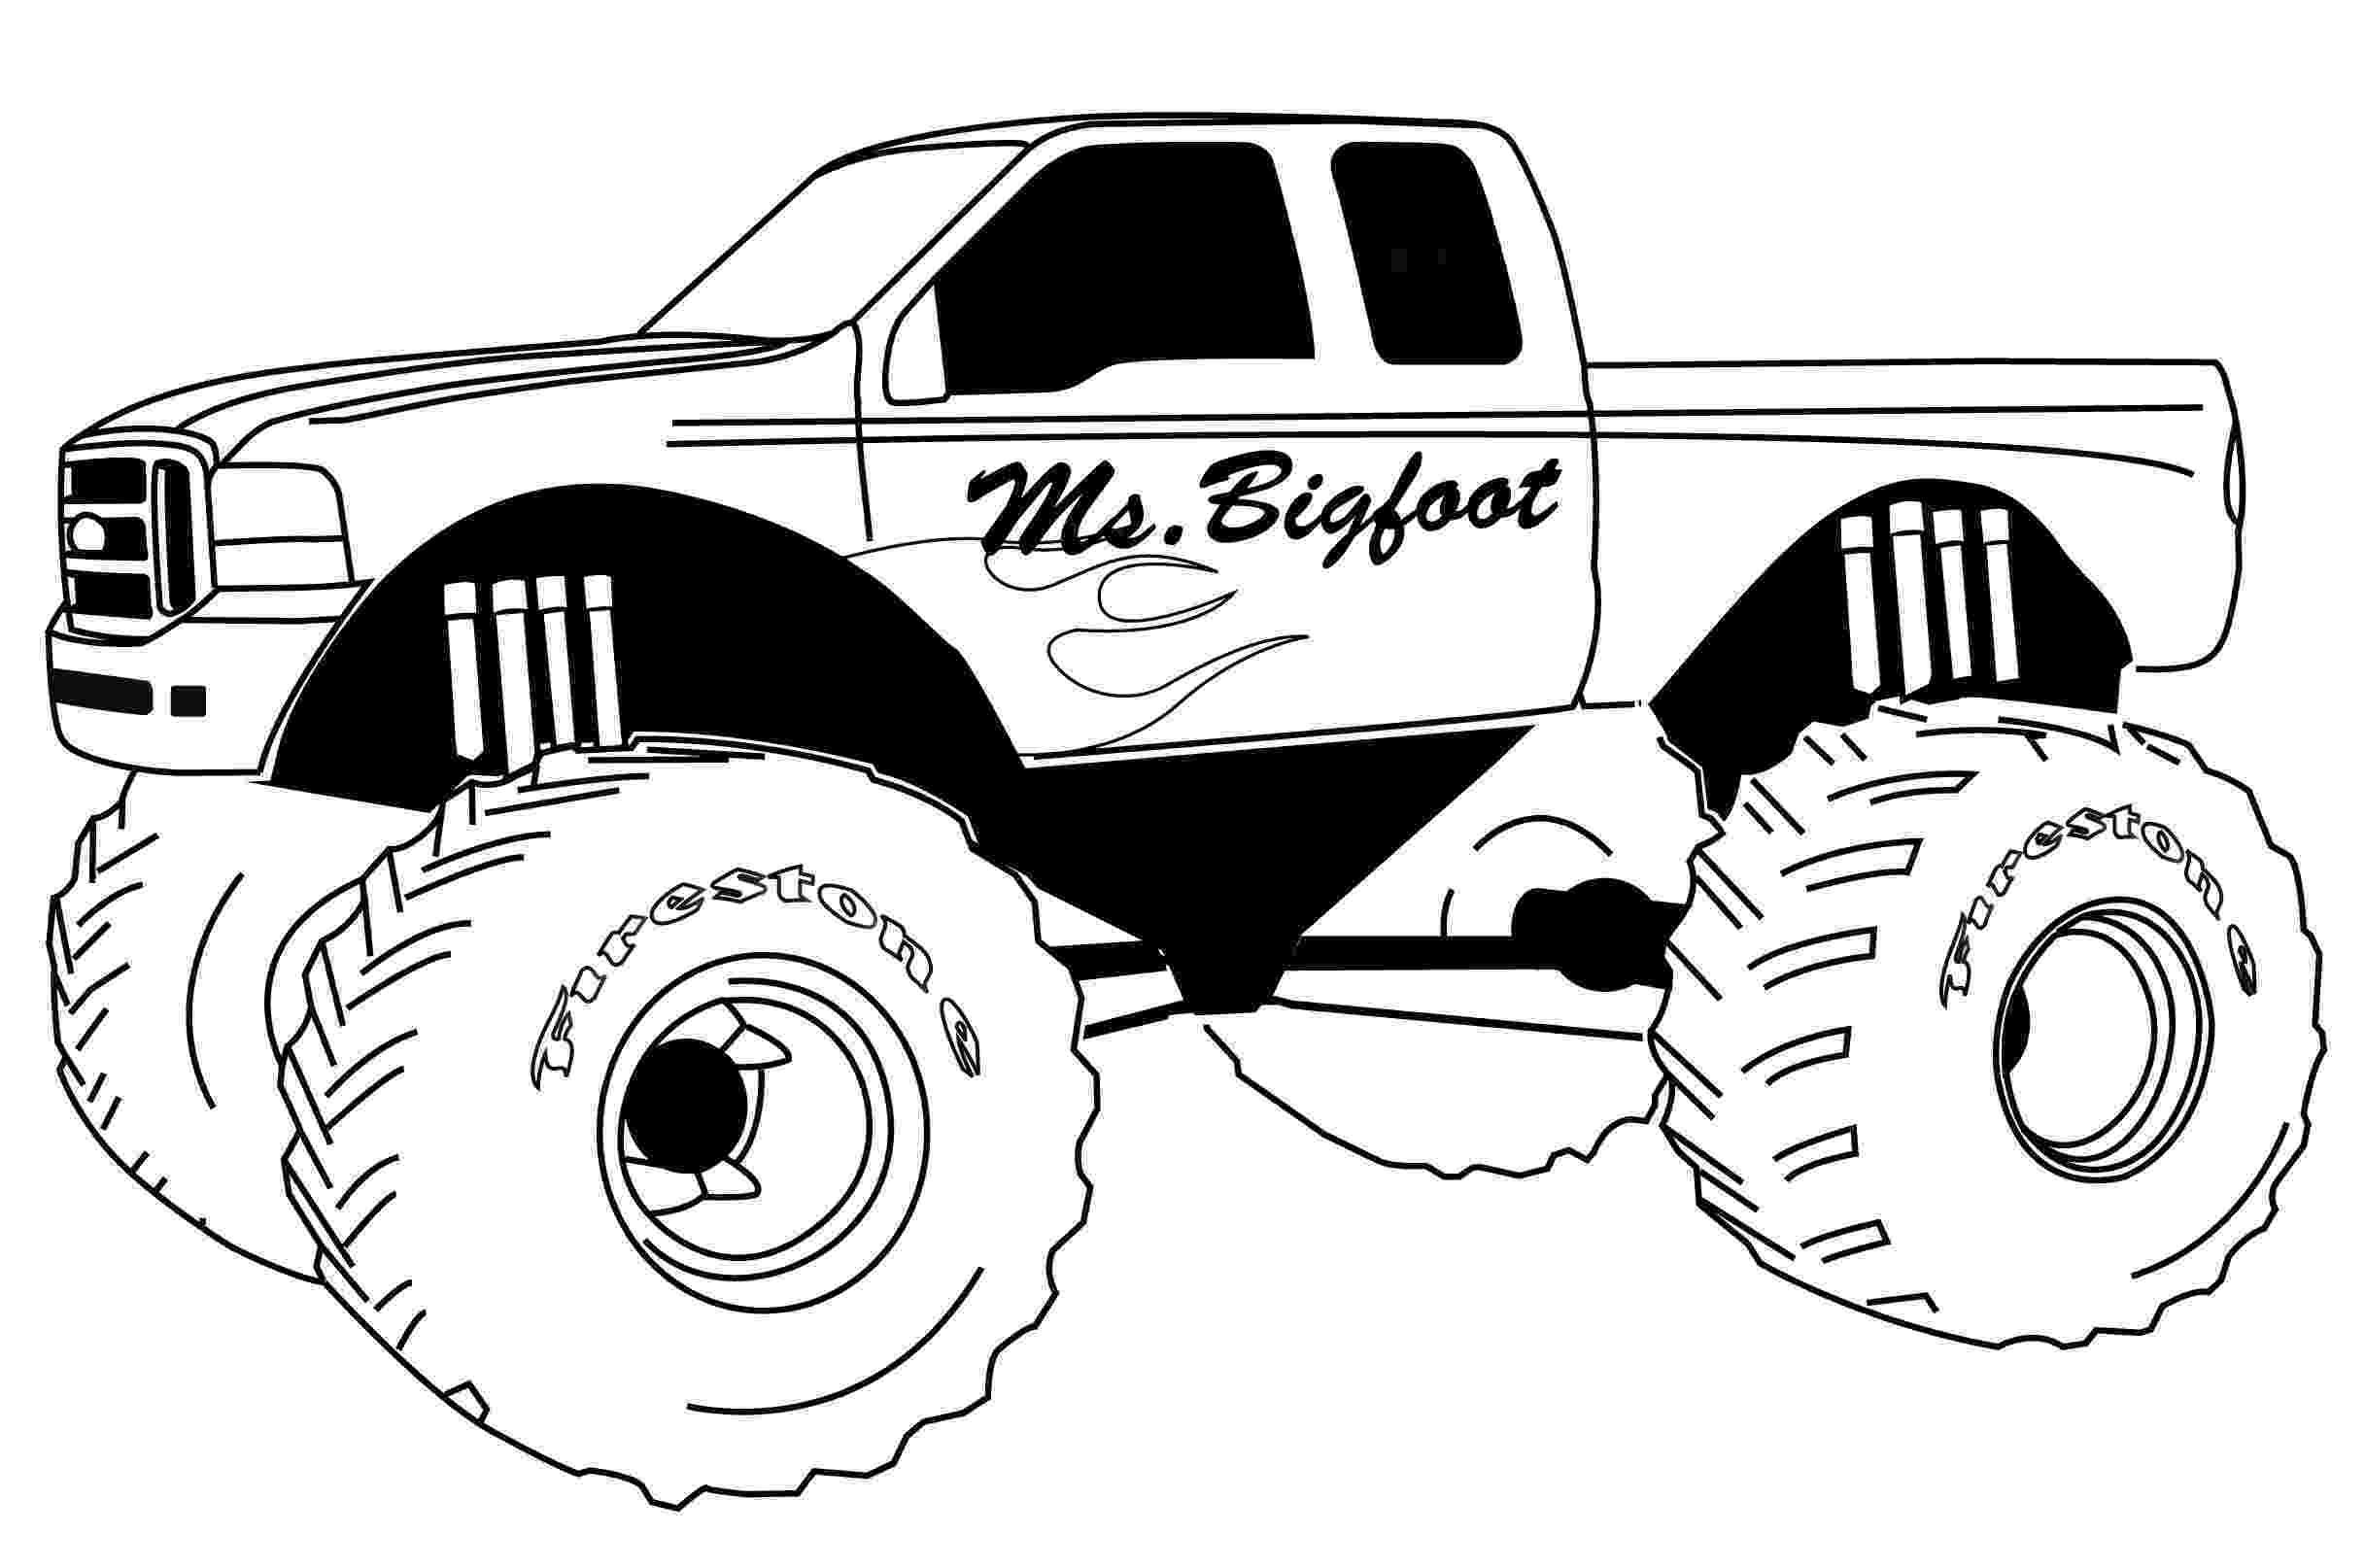 monster trucks colouring pages bigfoot monster truck coloring page free printable monster pages trucks colouring